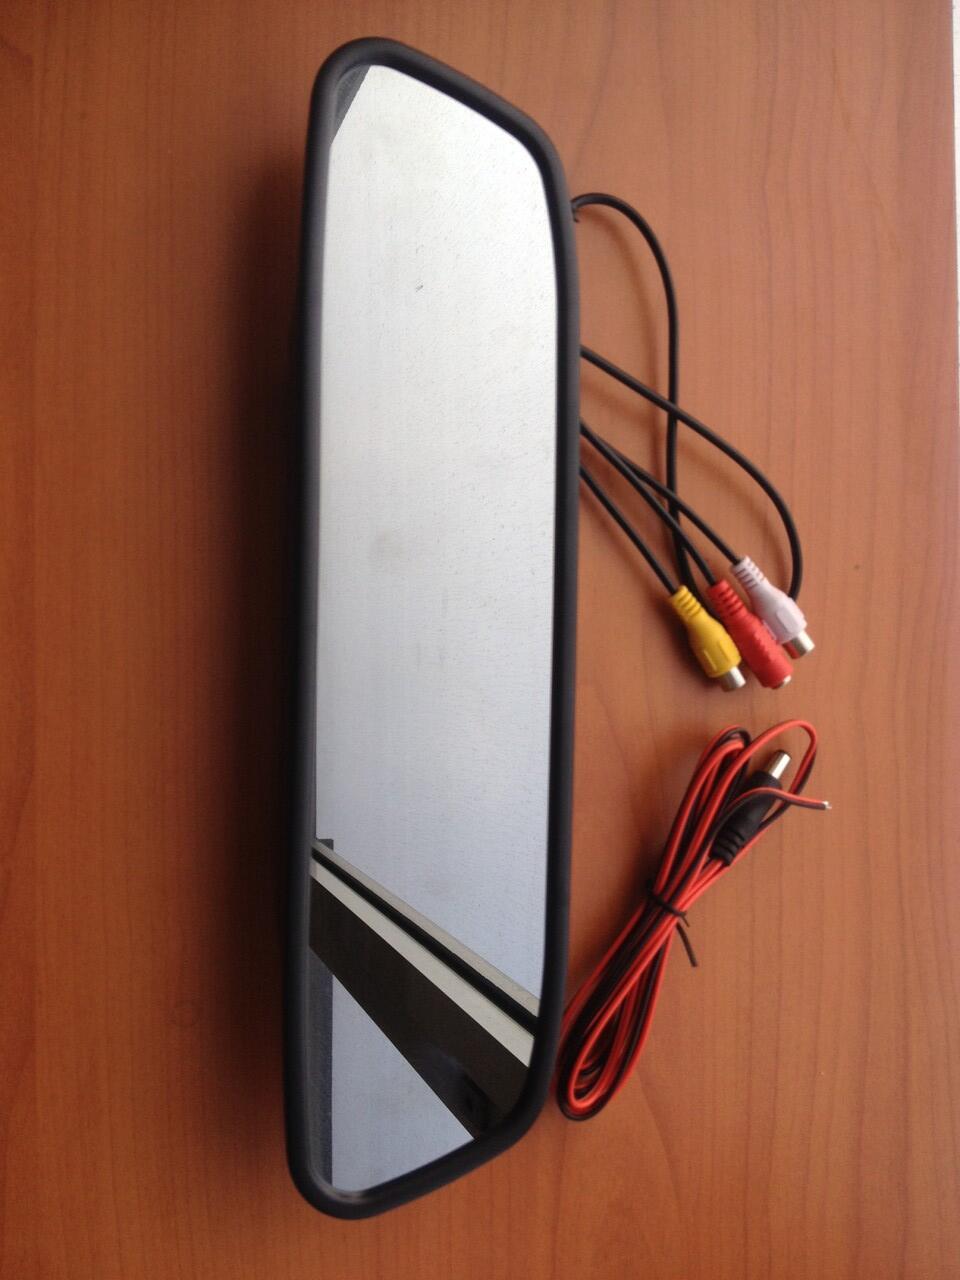 Kaca Spion mobil untuk kamera mundur